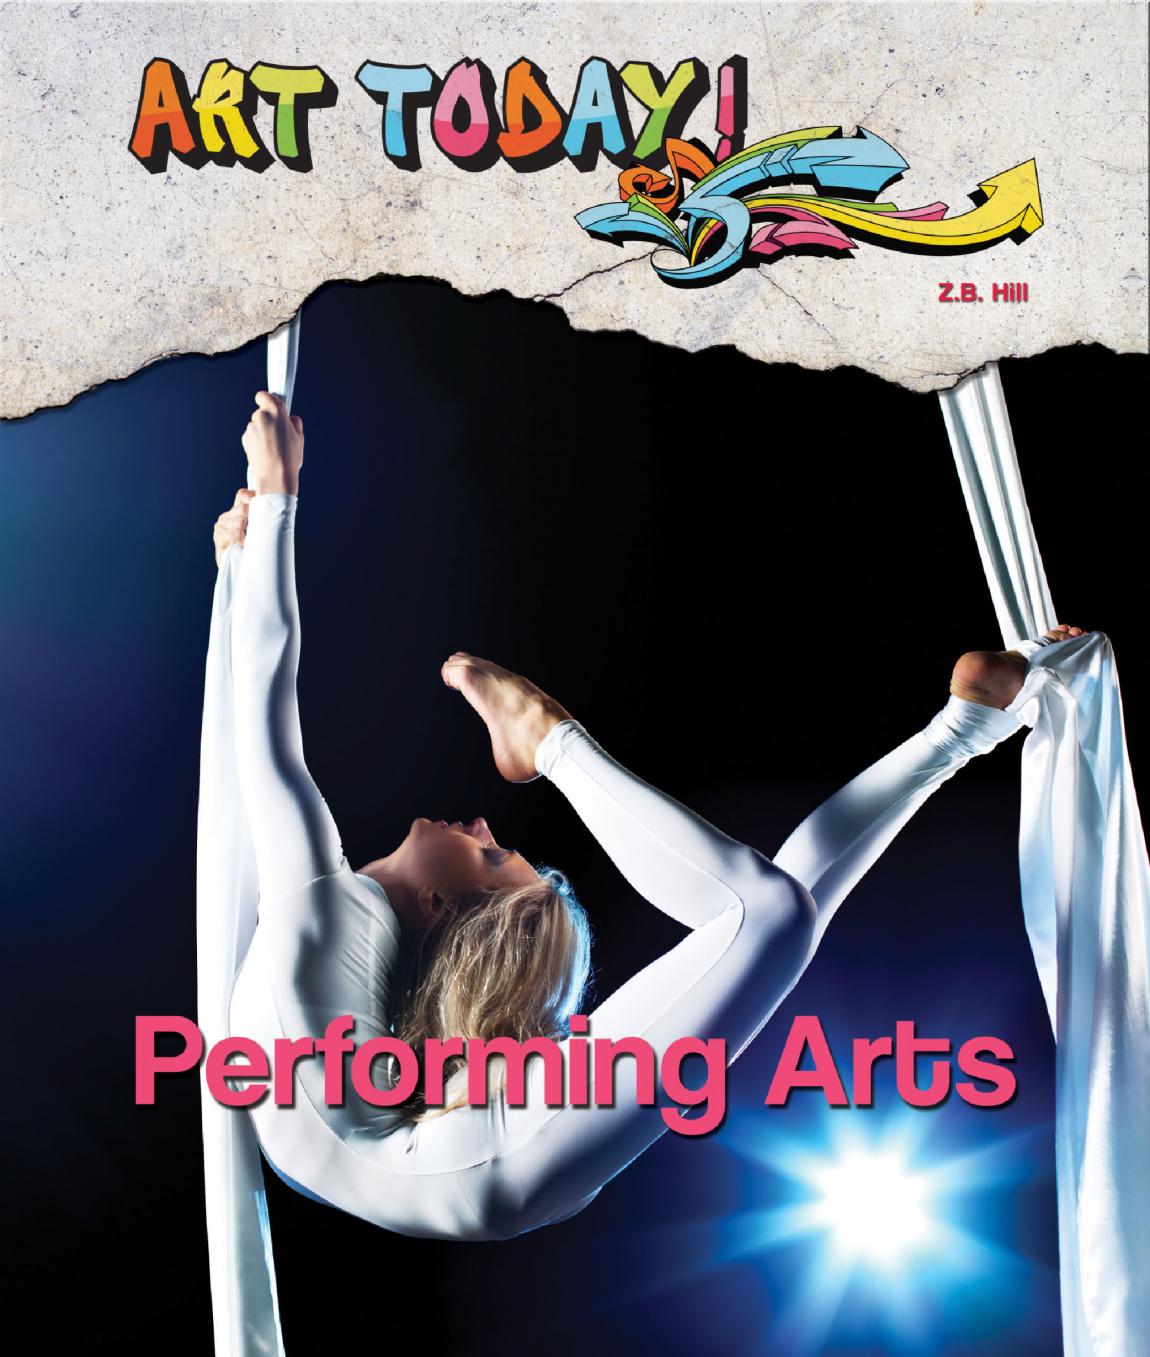 performing-arts-01.png